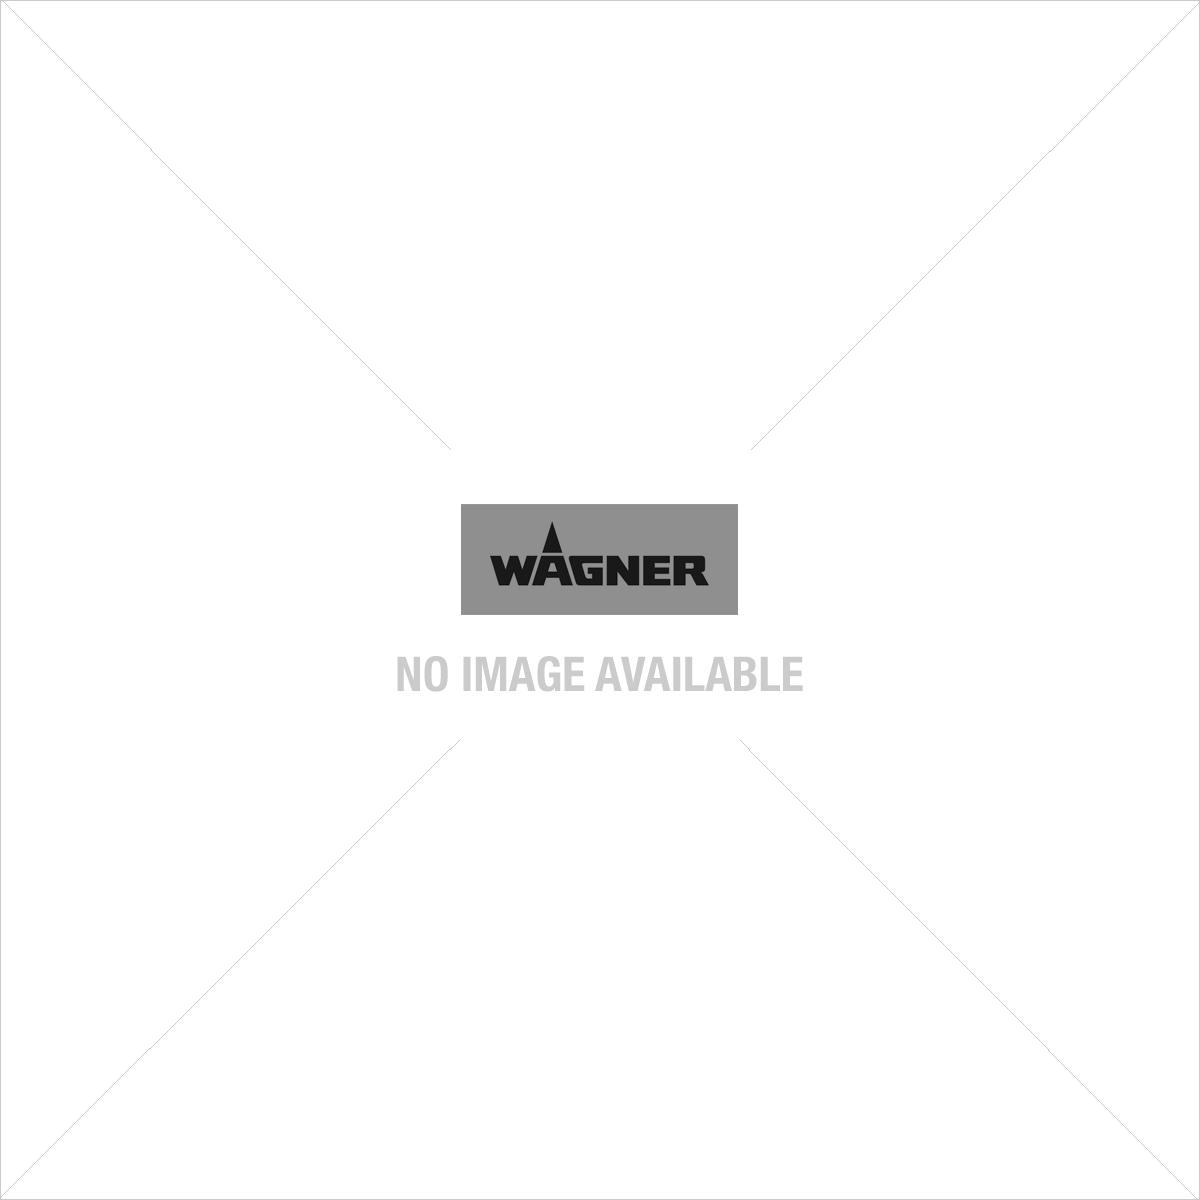 Wagner Wood & Metal Sprayer W 300 HVLP Paint Sprayer